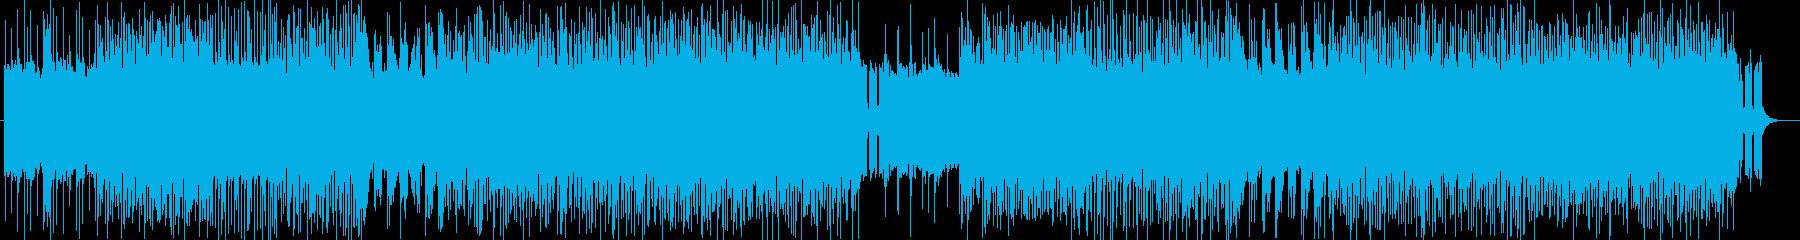 「HR/HM」「DARK」BGM272の再生済みの波形